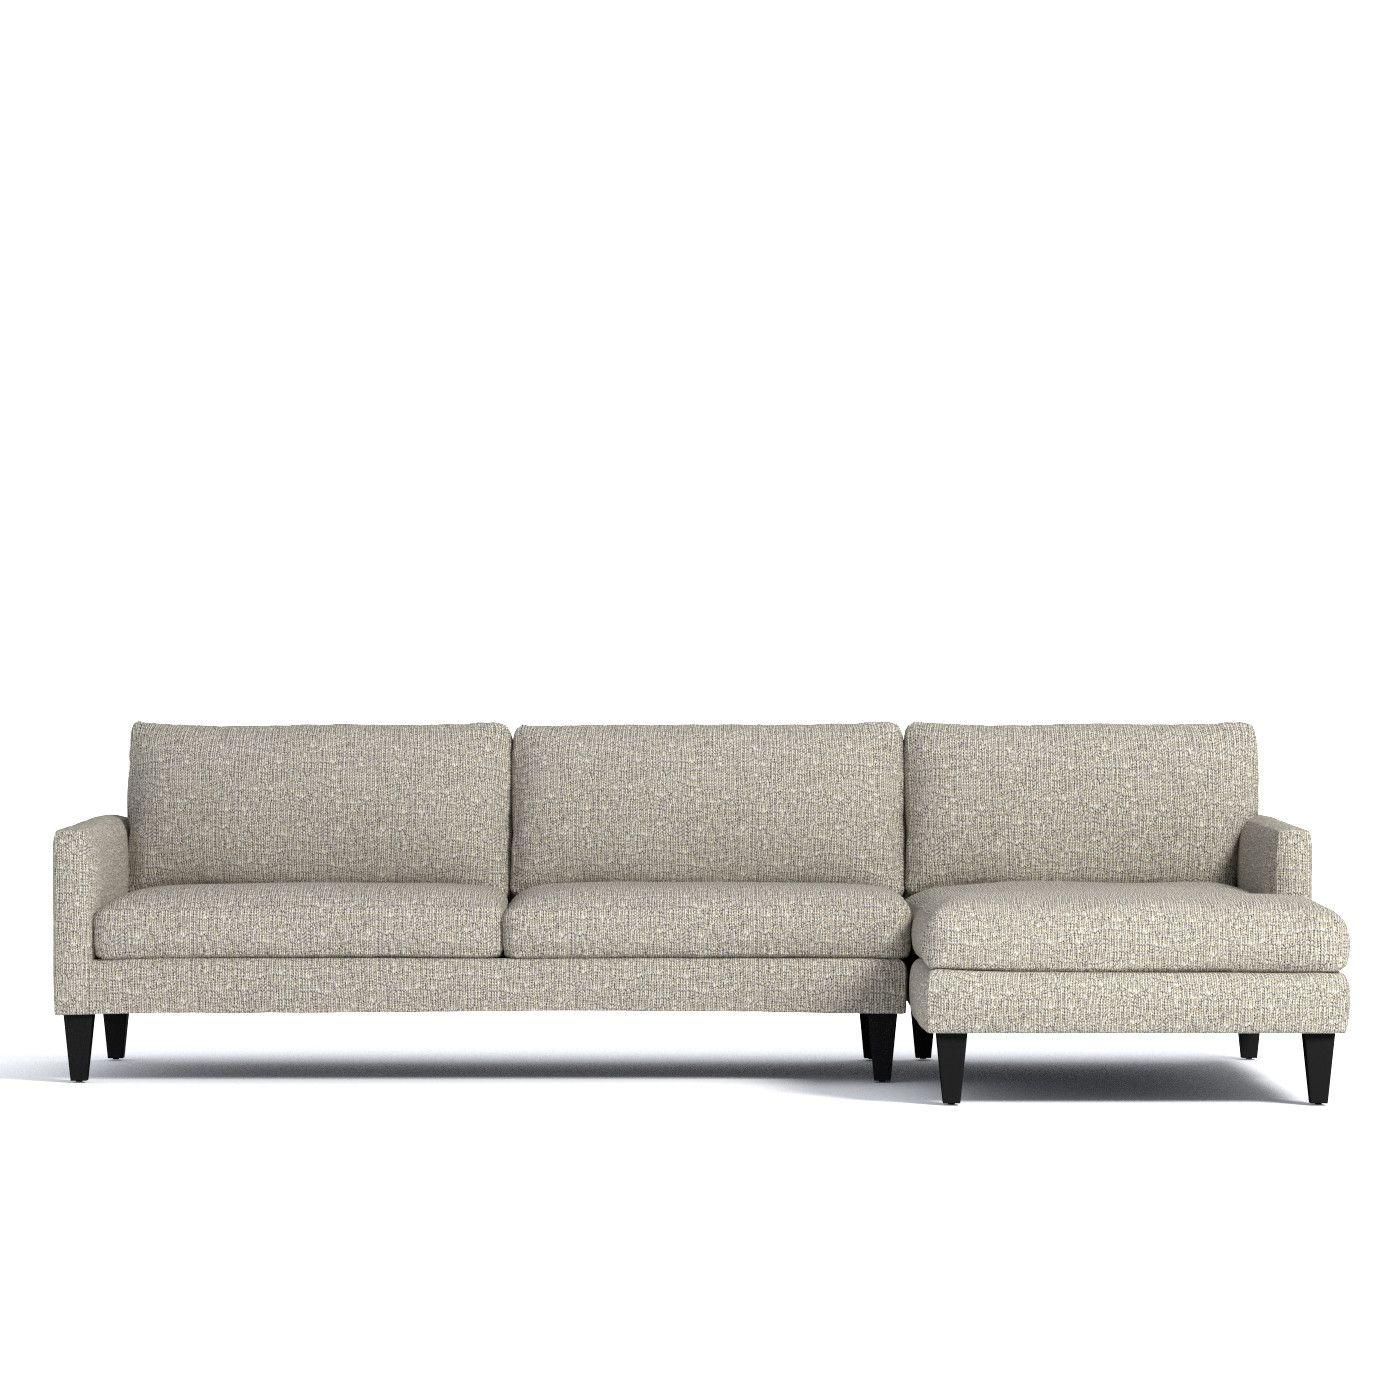 Formosa 2pc Sectional Sofa Leg Finish Pecan Configuration